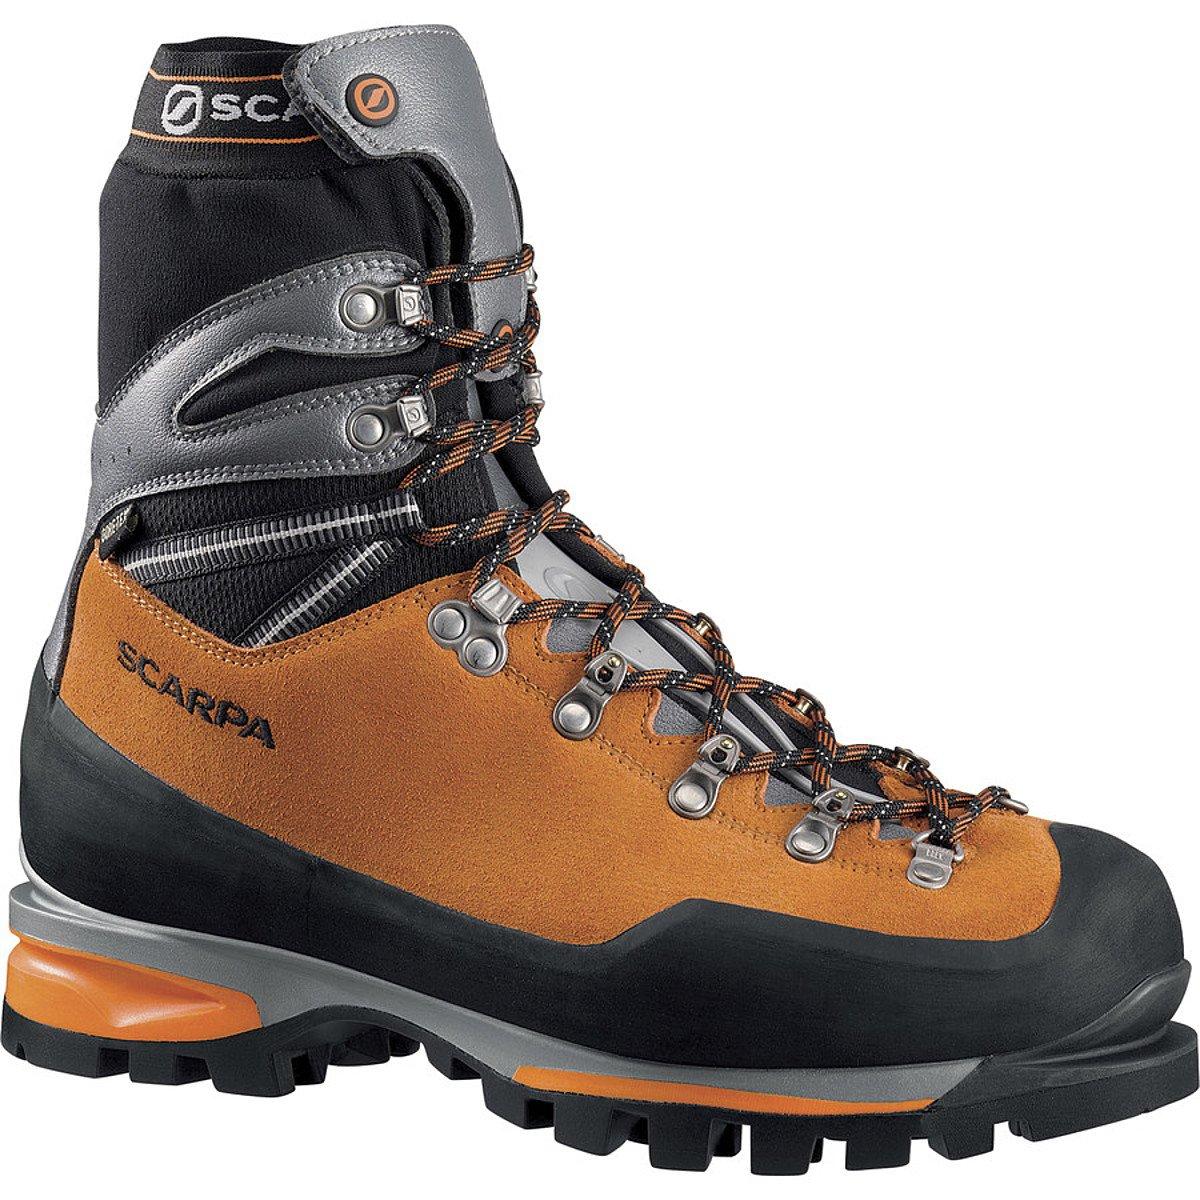 Scarpa Men's Mont Blanc Pro GTX Mountaineering Boot, Orange, 45 EU/11.5 M US